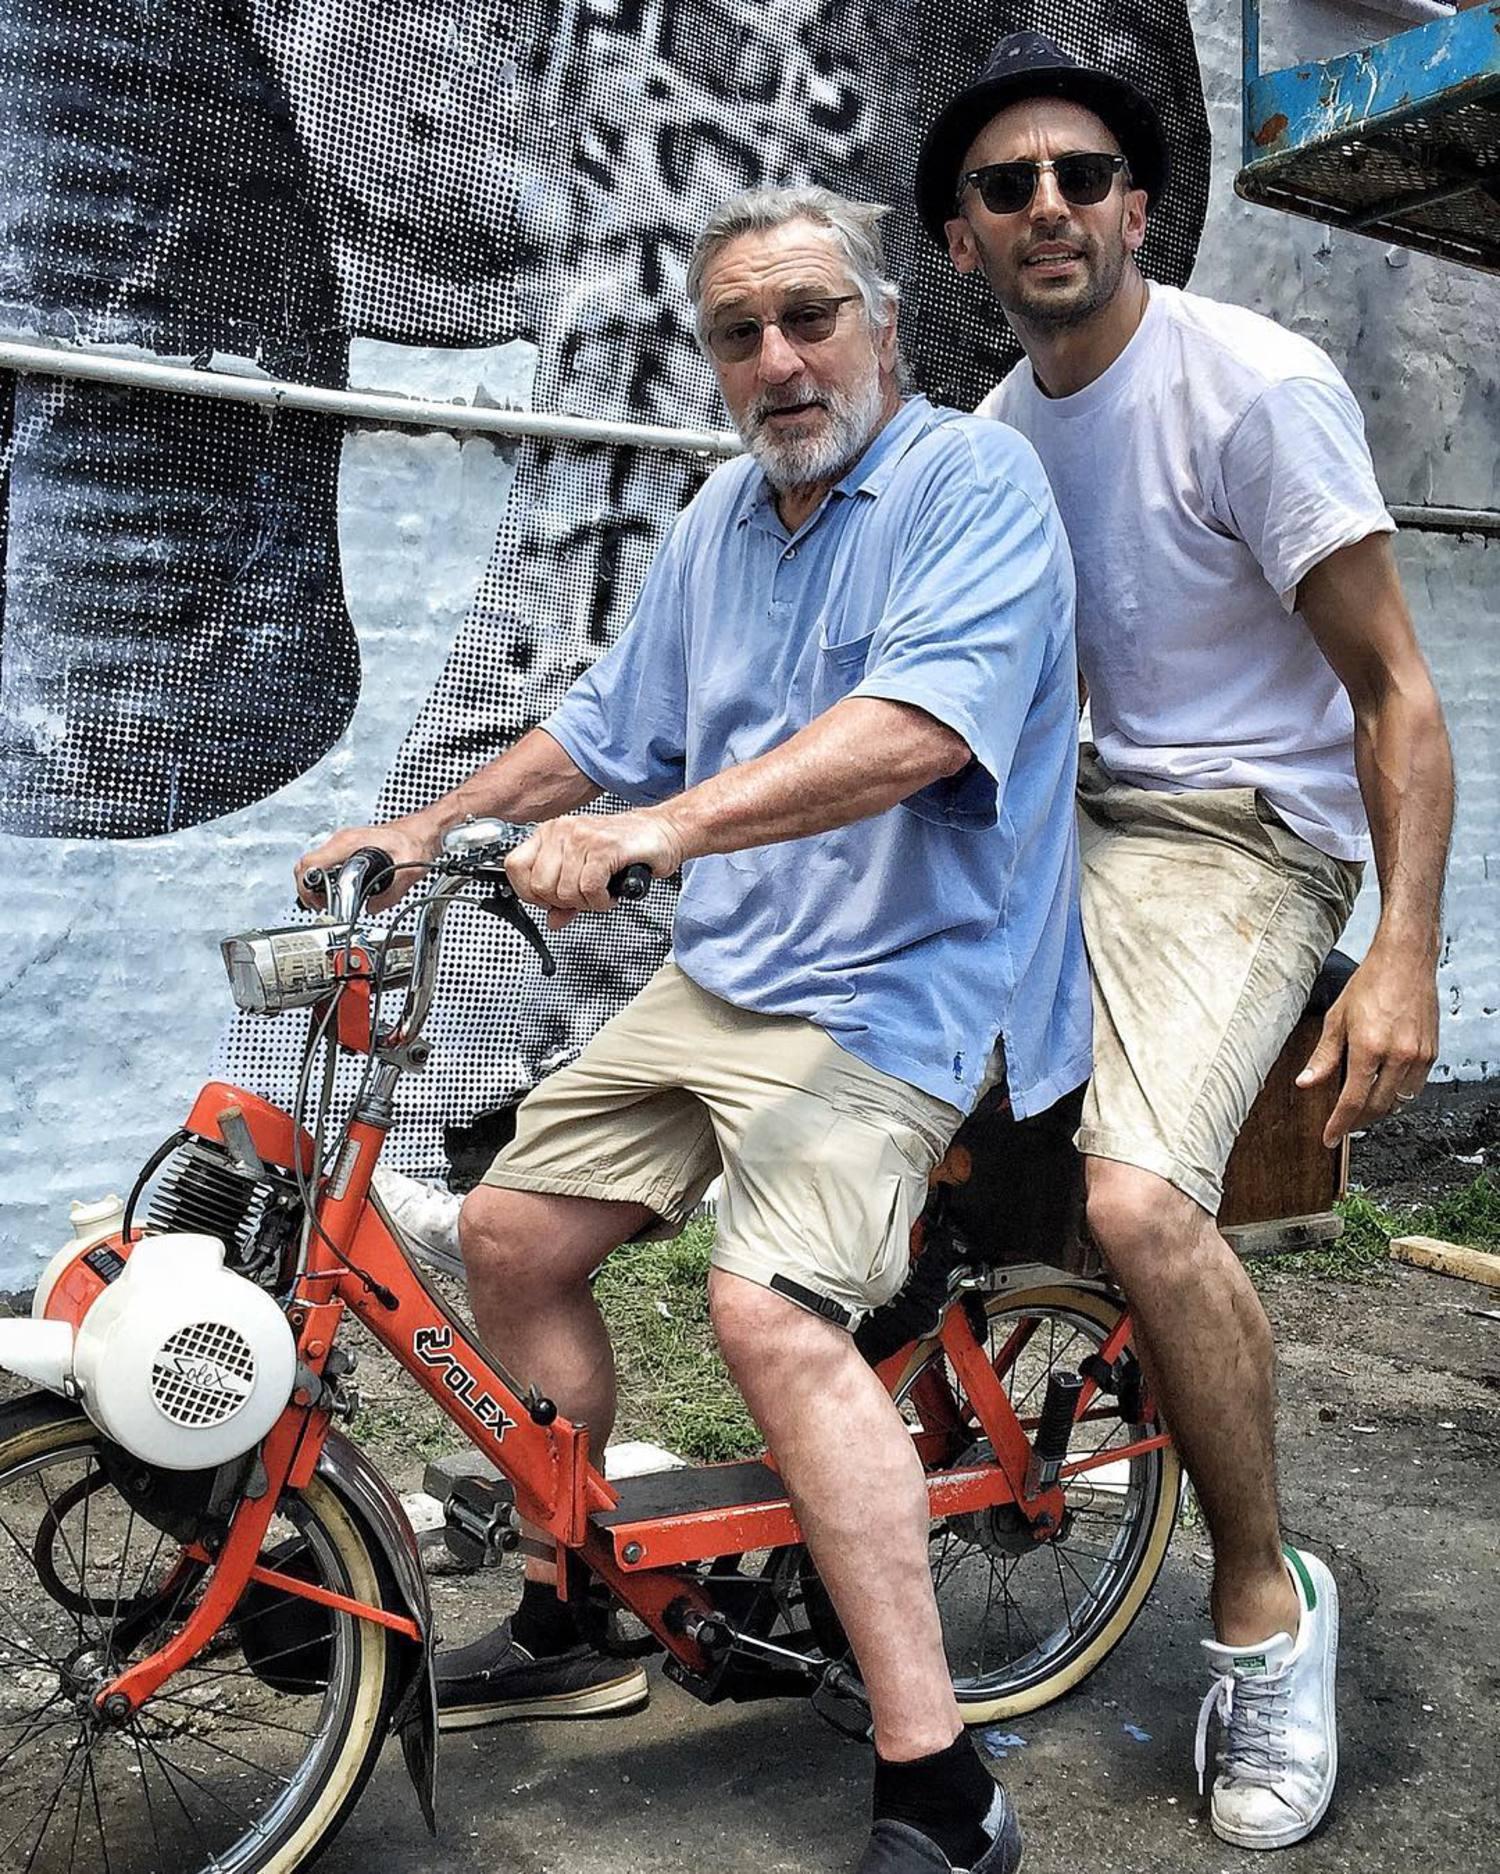 New York City 👊🏻 Pasting Day 1  #Migrants #EllisIsland #RobertDeNiro - Ellis the film is on free access on both @itunes and on @netflix 📽 📸 @lucca